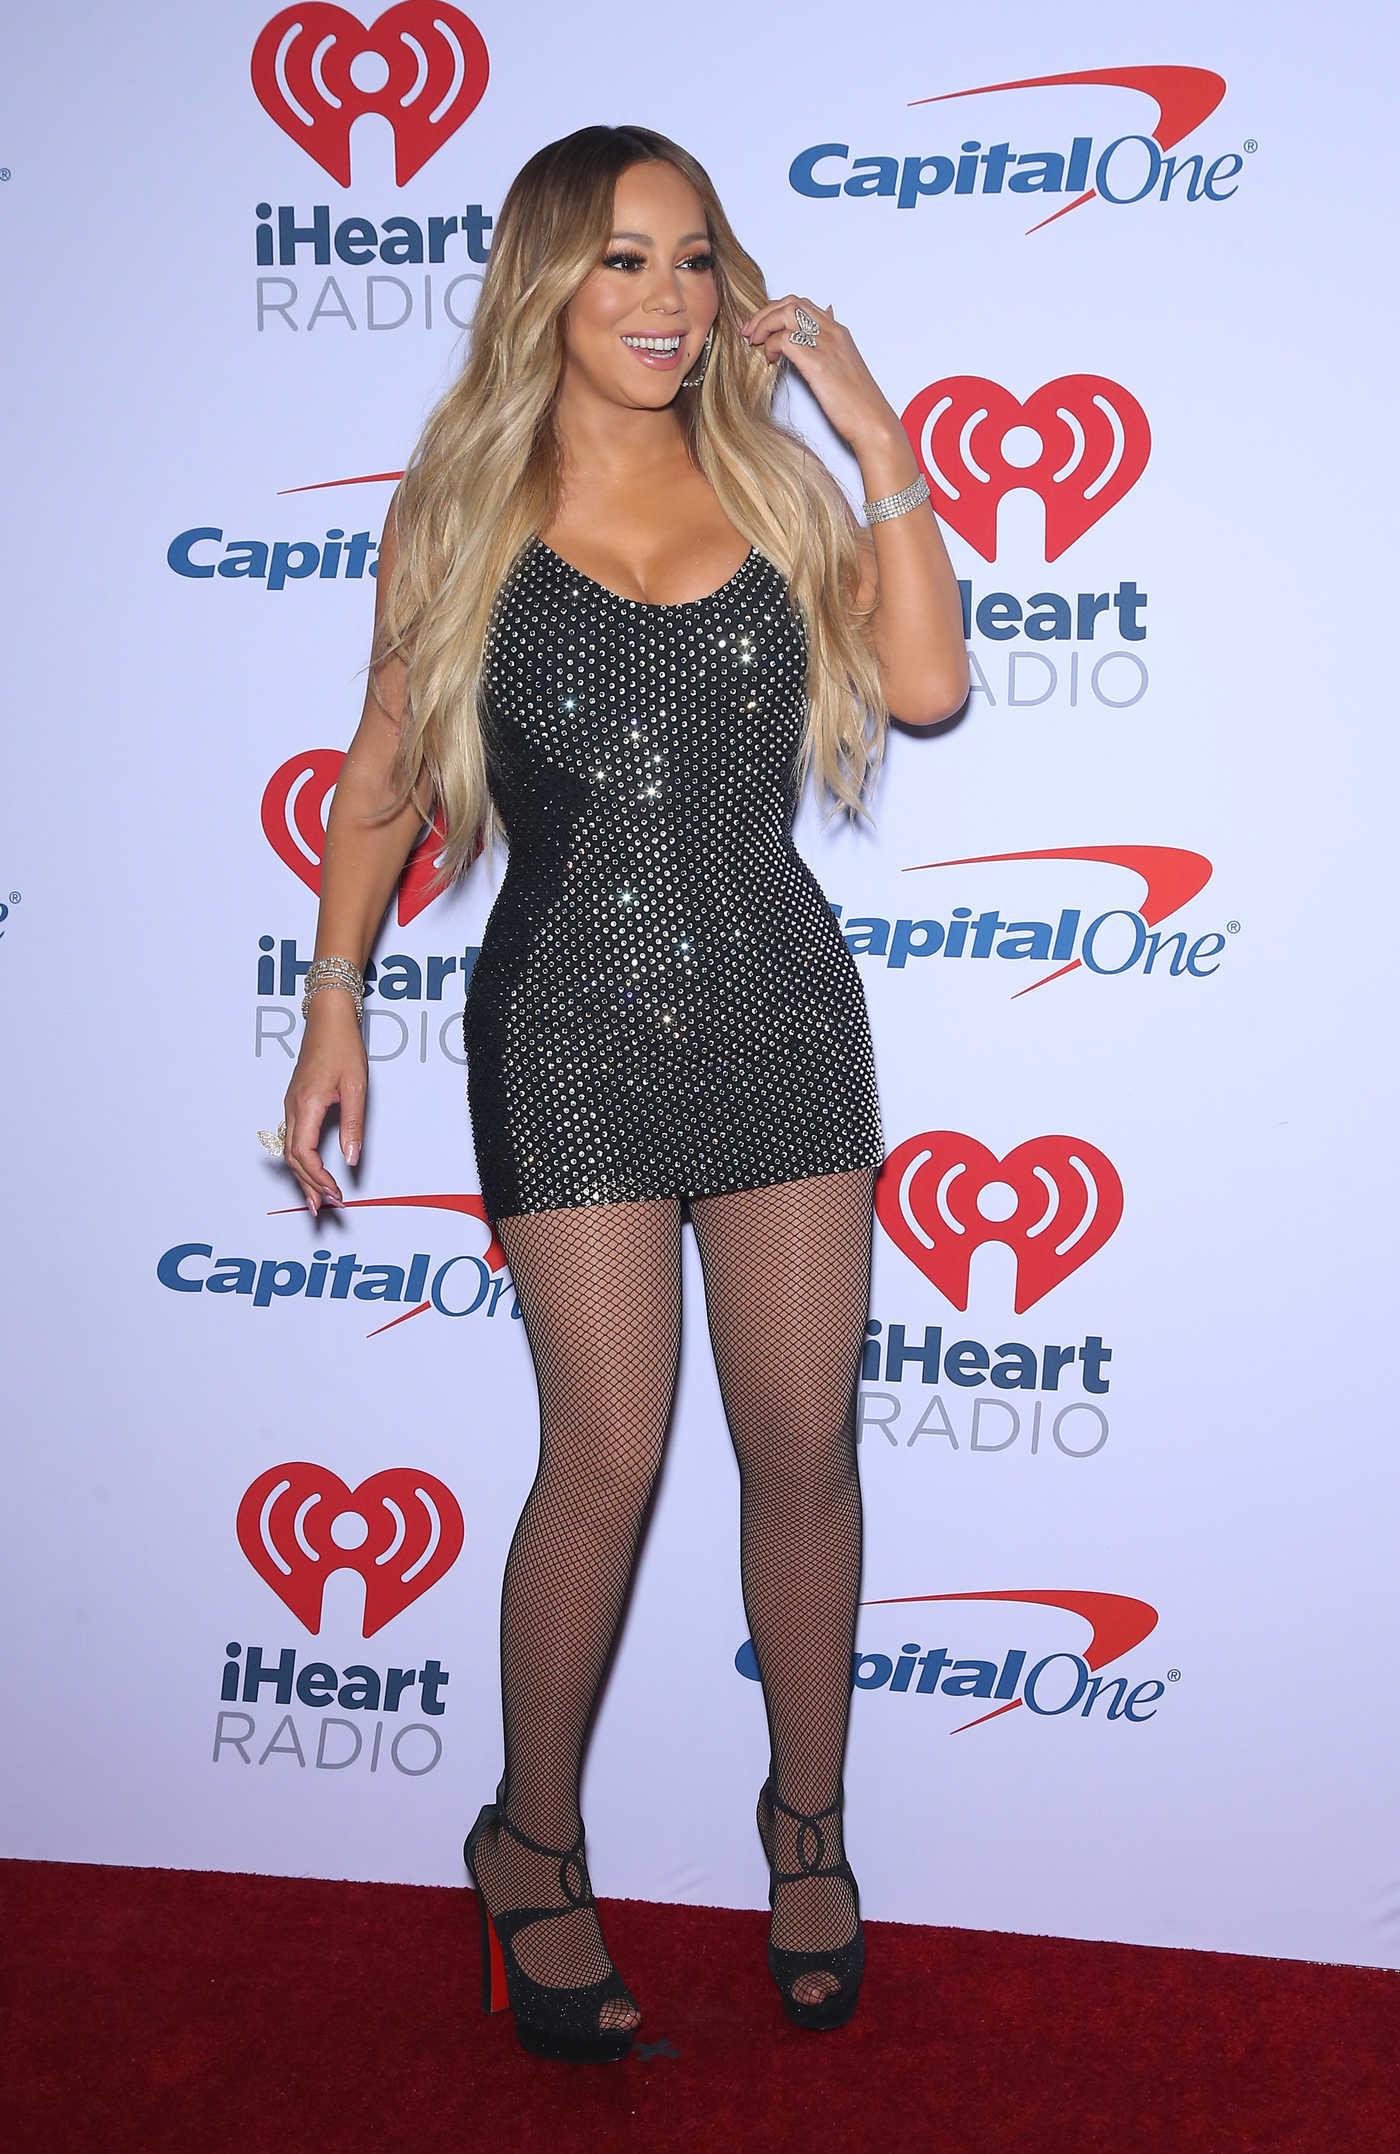 Mariah Carey Attends iHeartRadio Music Festival at T-Mobile Arena in Las Vegas 09/21/2018